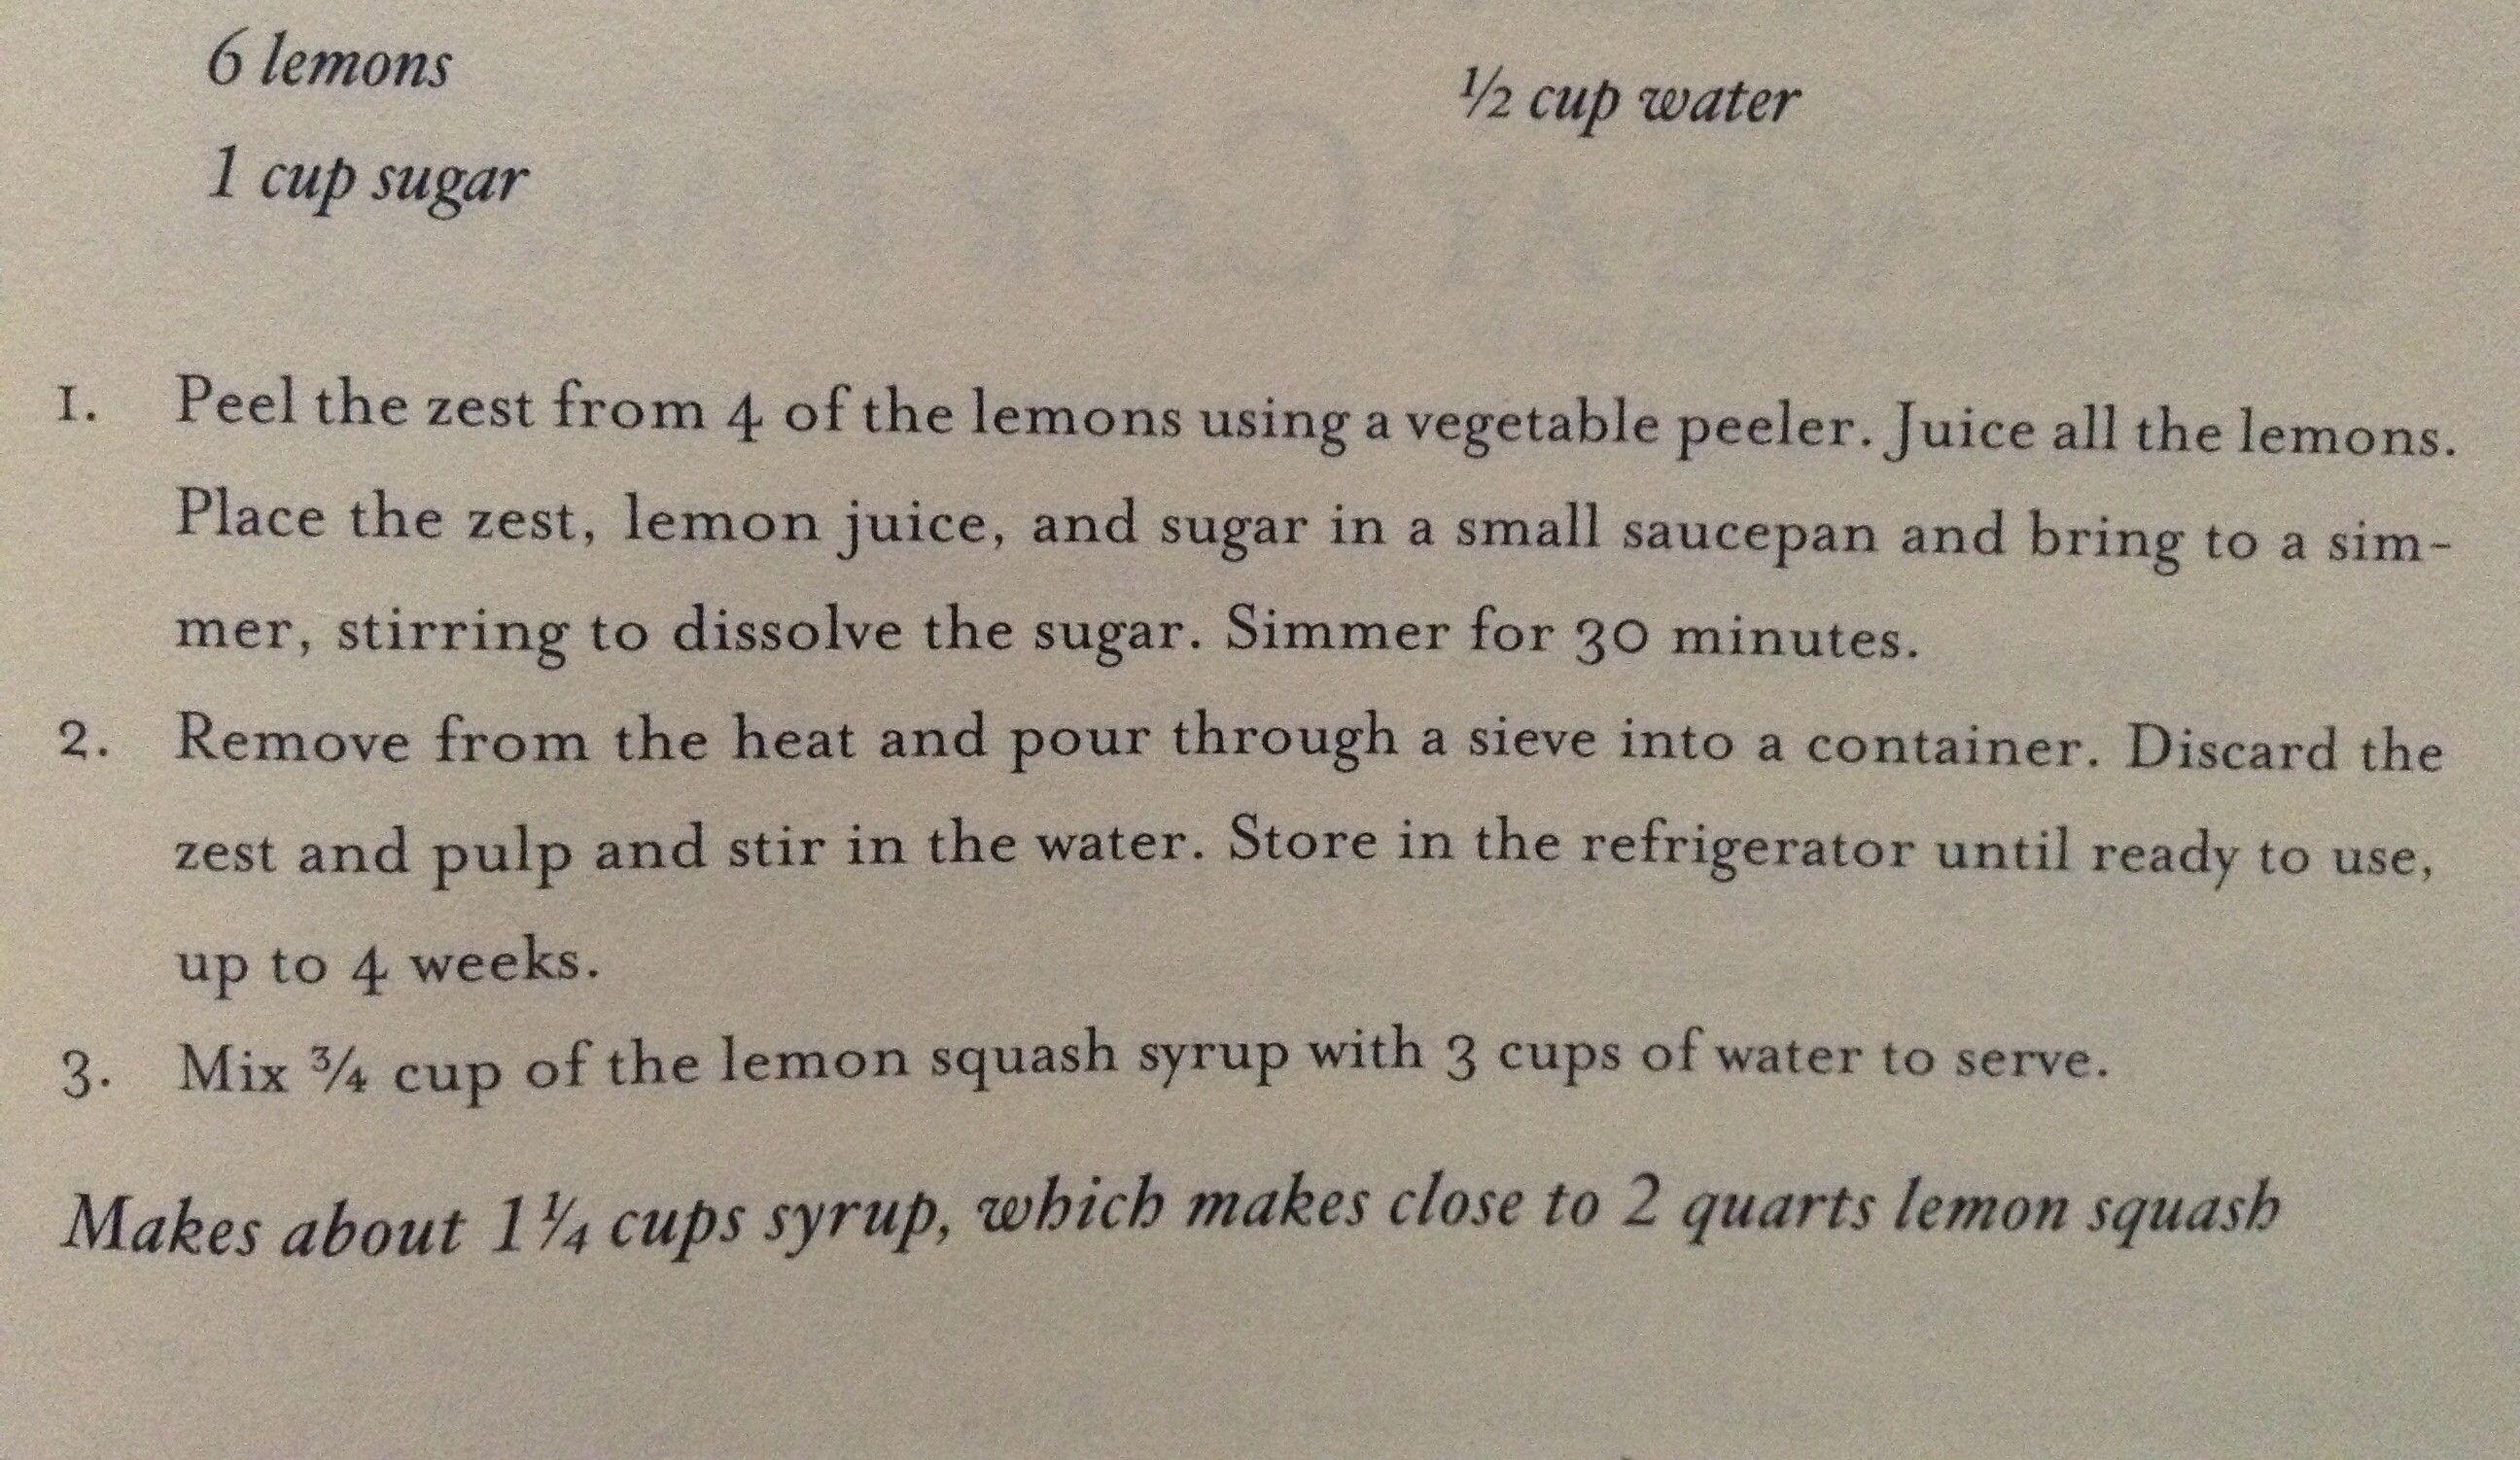 Lemon Squash-Unofficial Narnia Cookbook